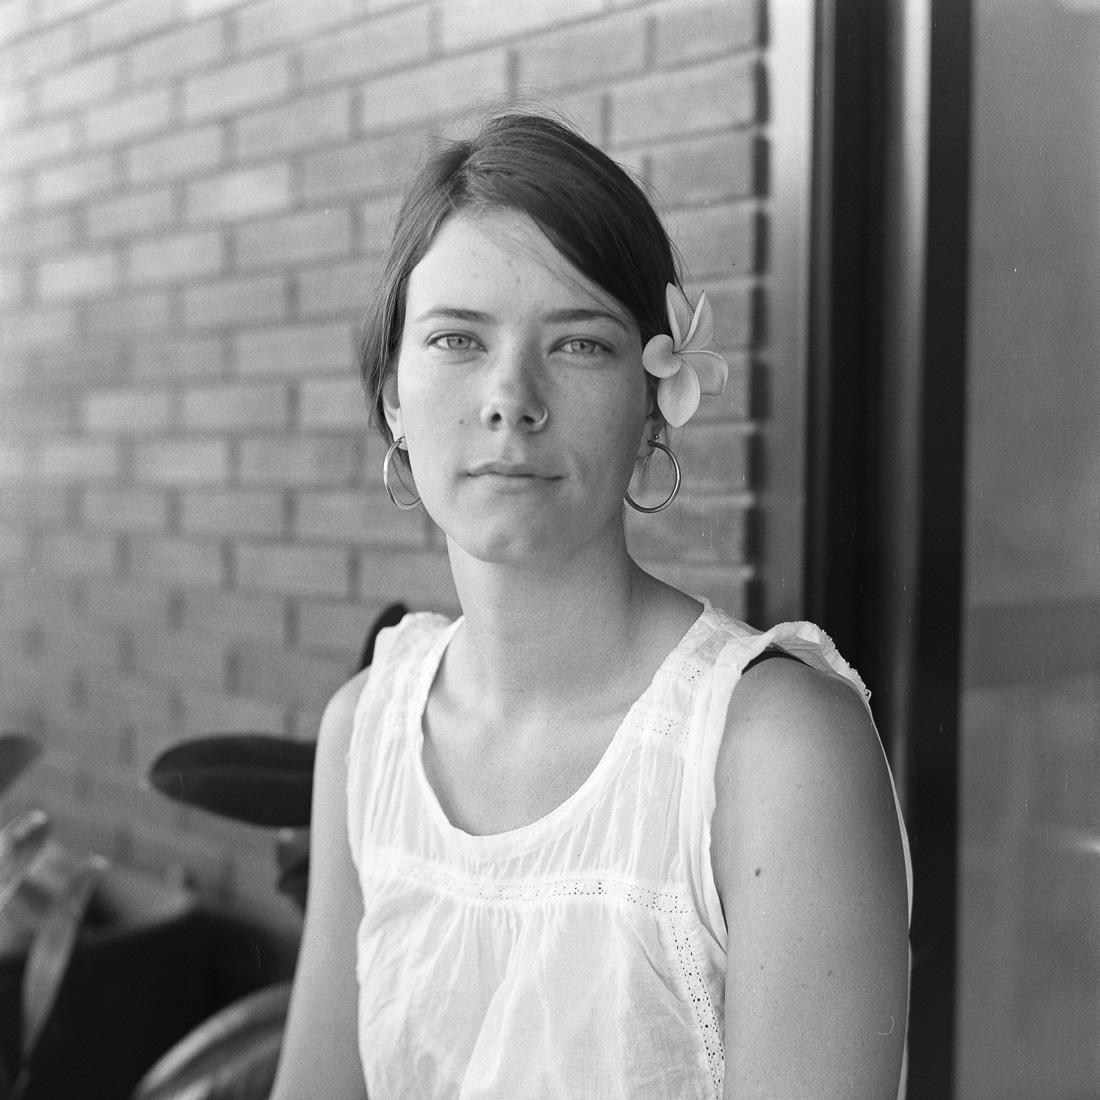 20190112 - Roll 270 - 009-Nick-Bedford,-Photographer-80mm F2.8, Black and White, Brisbane, Ilford HP5+, Medium Format, Rolleiflex 2.8D.jpg